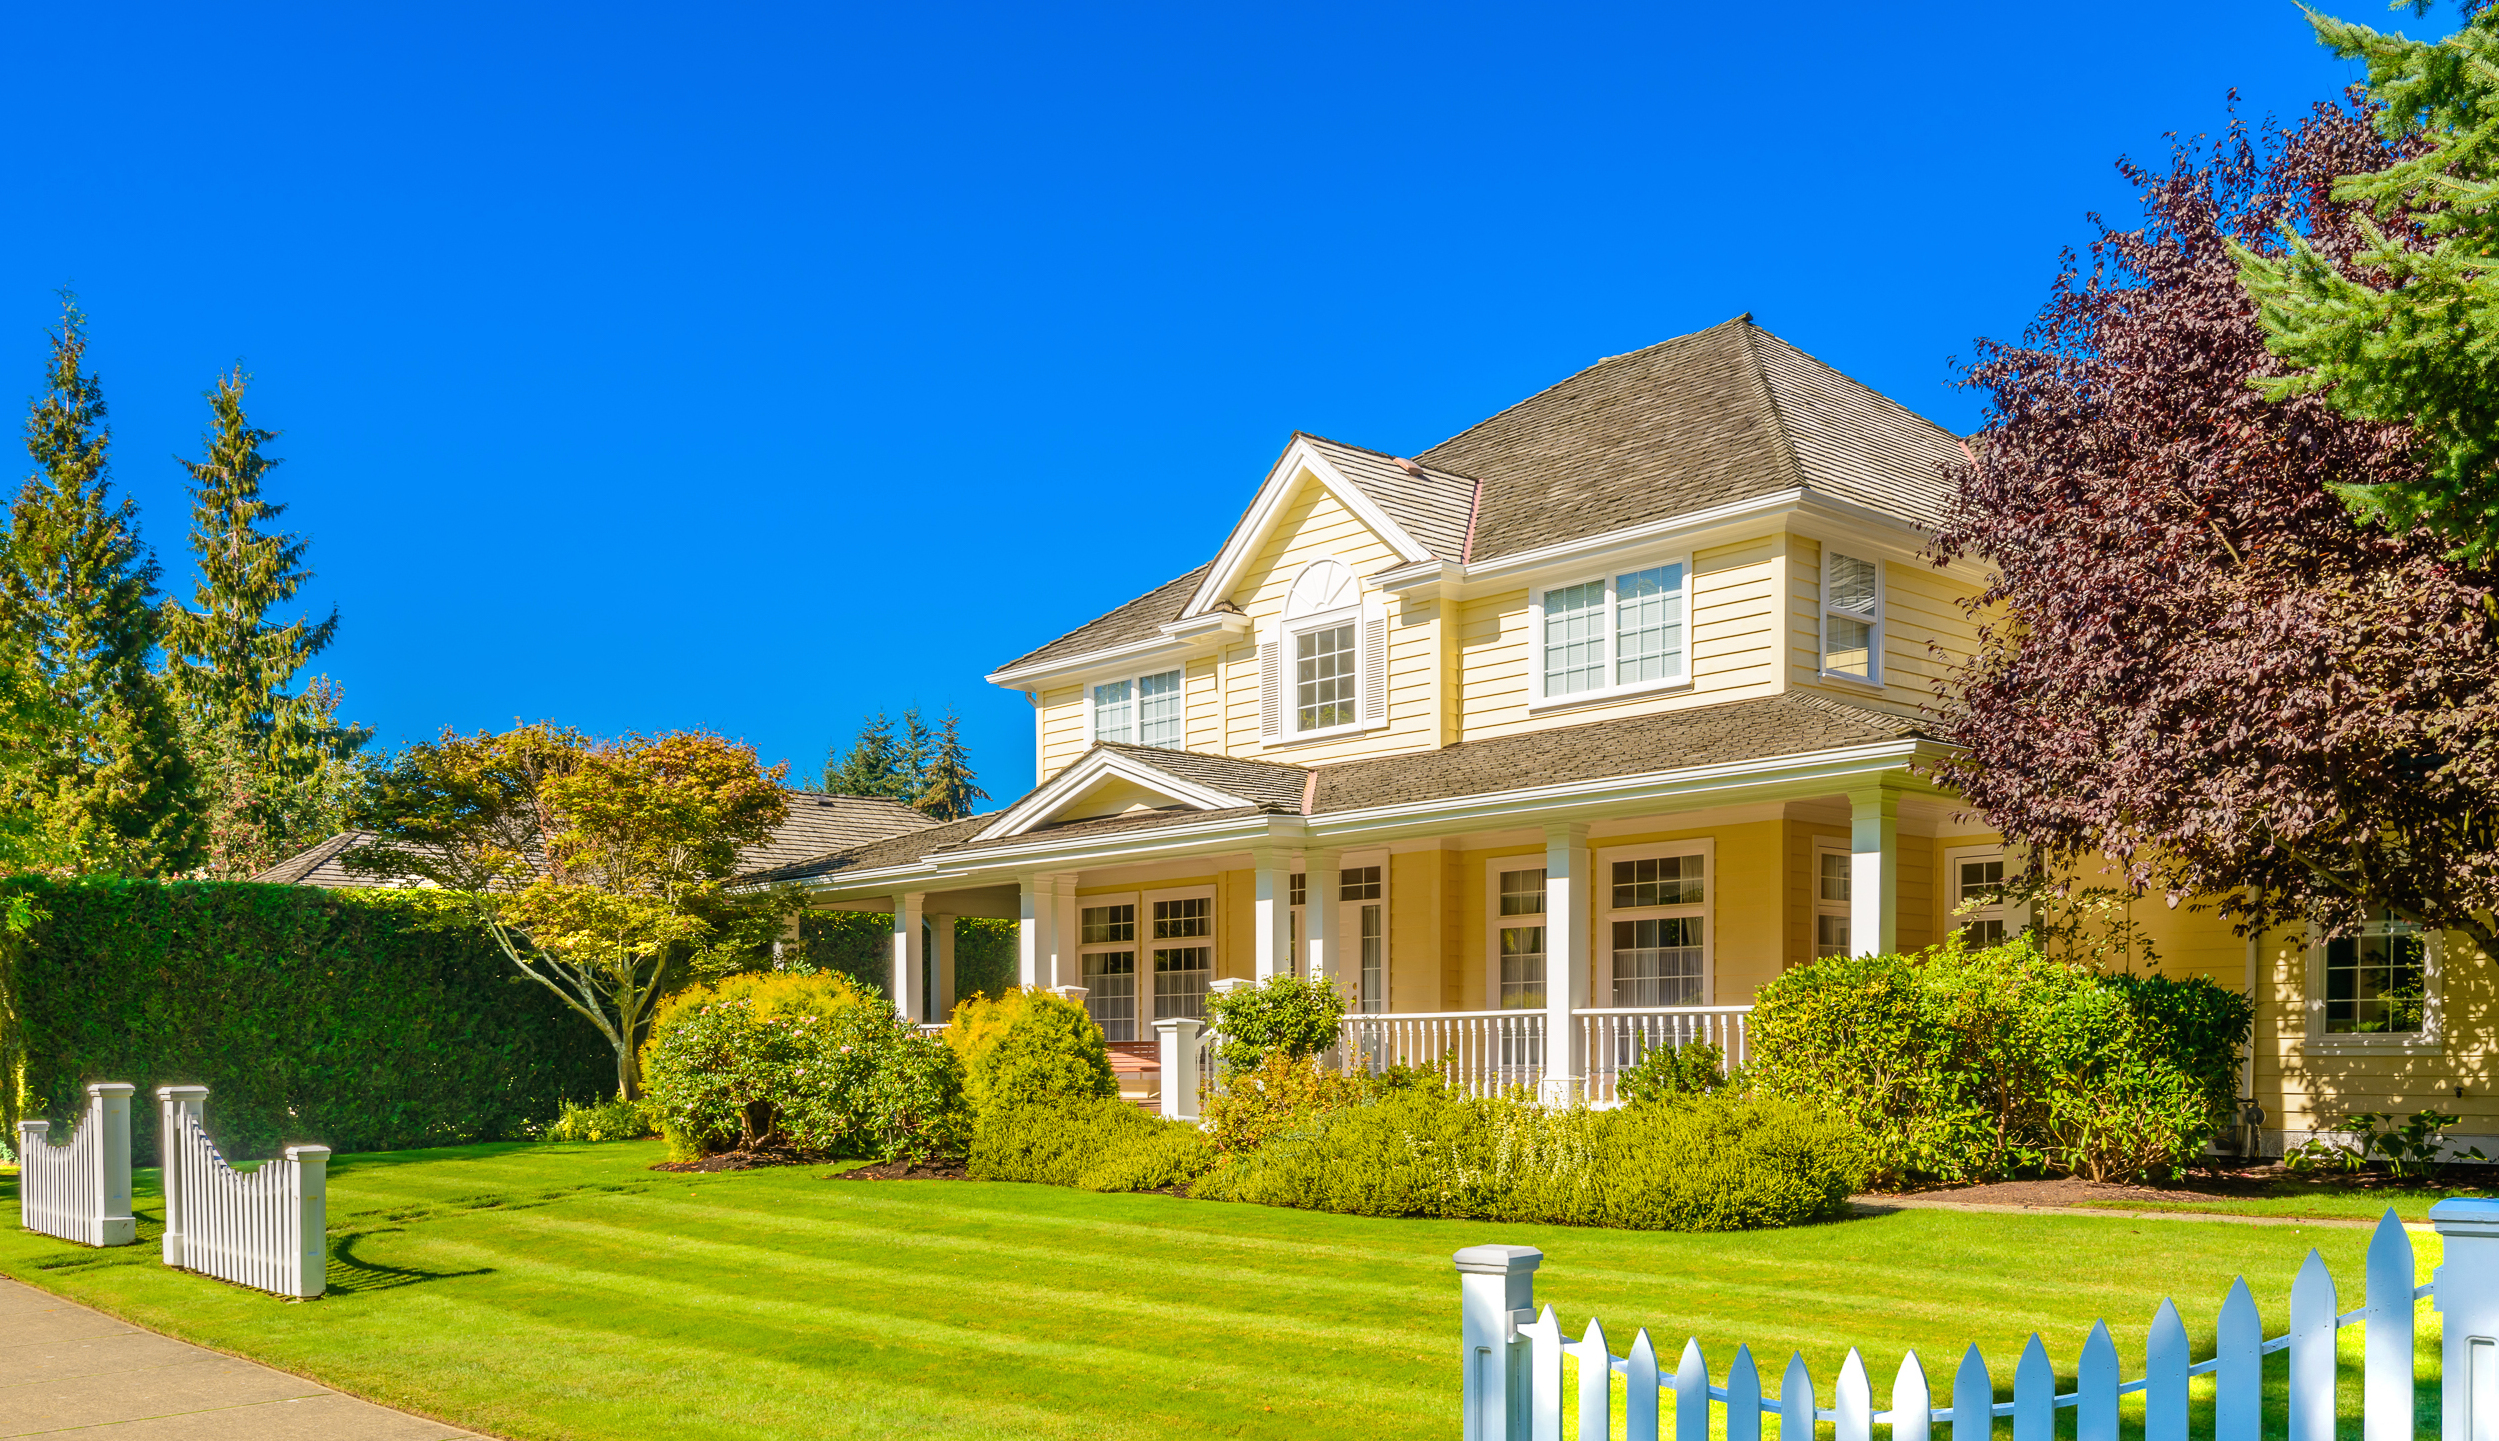 Elk Grove Ford >> Spokane-Mead-School-District -Area-MLS-Homes-Houses-Properties-Real-Estate-For-Sale